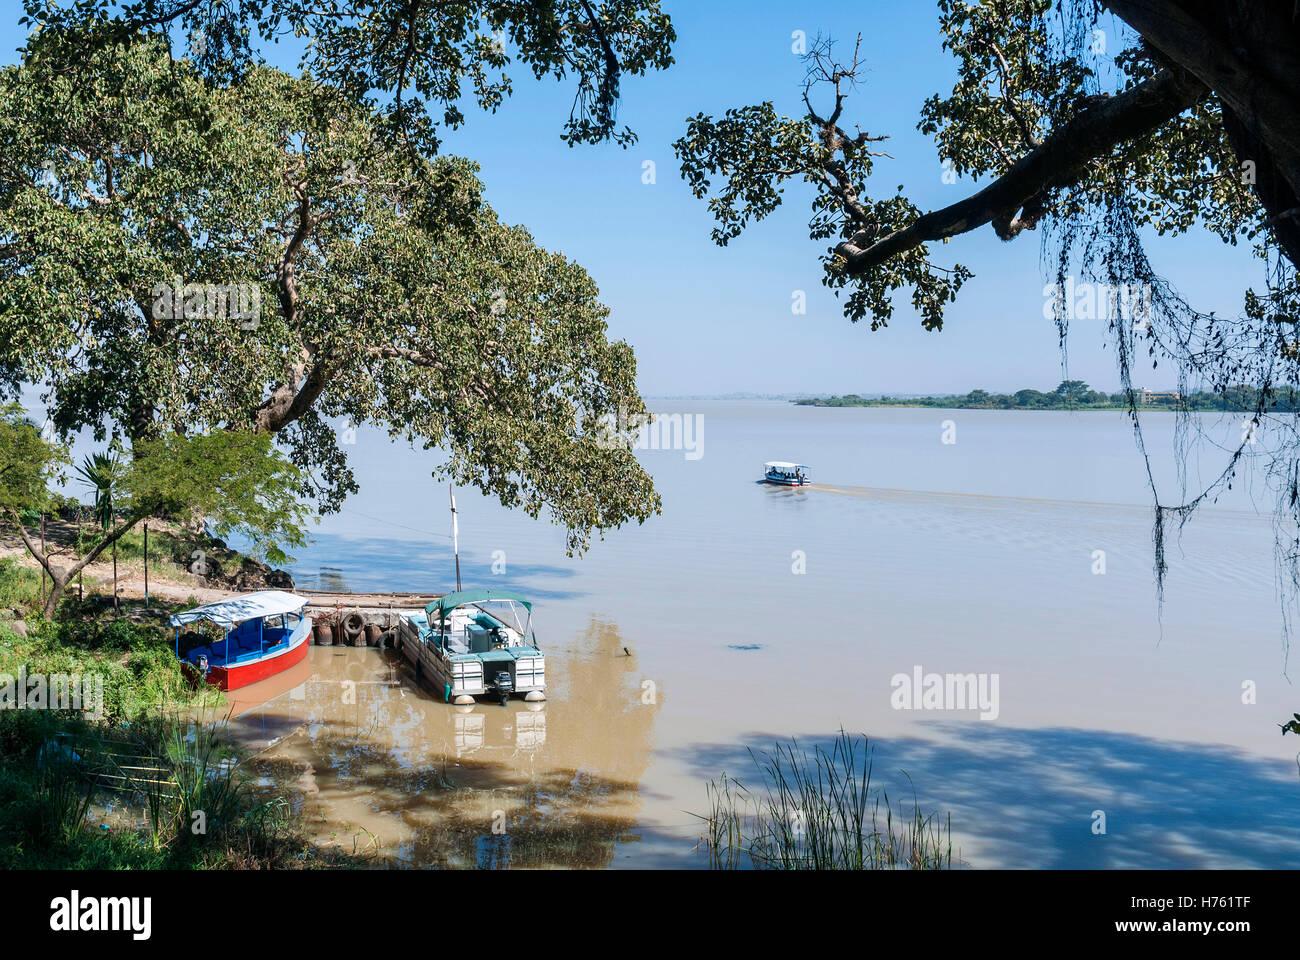 view of boats on famous lake tana near bahir dar ethiopia - Stock Image